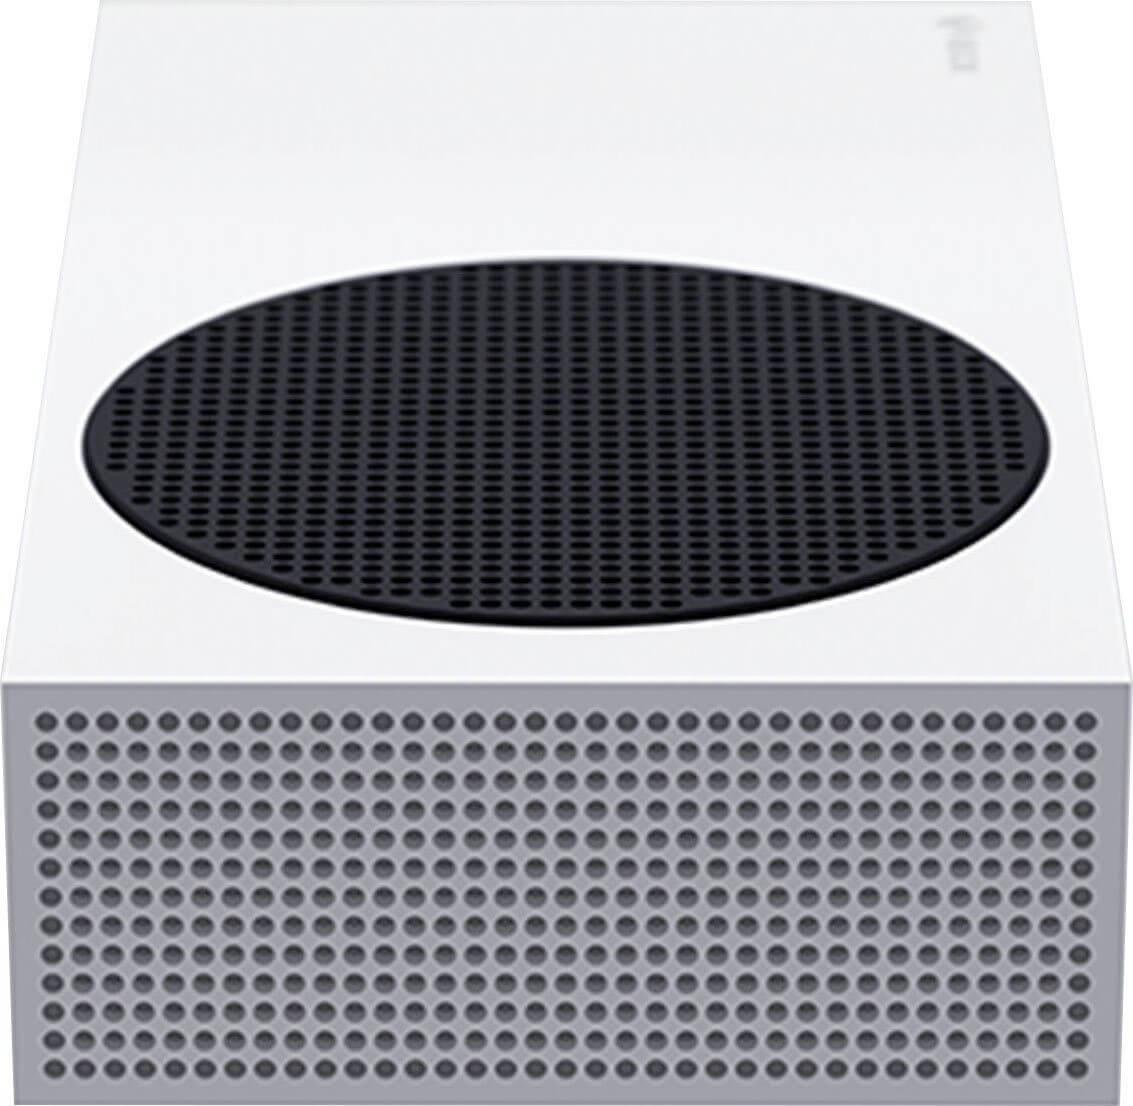 Xbox Series S Consoles 3